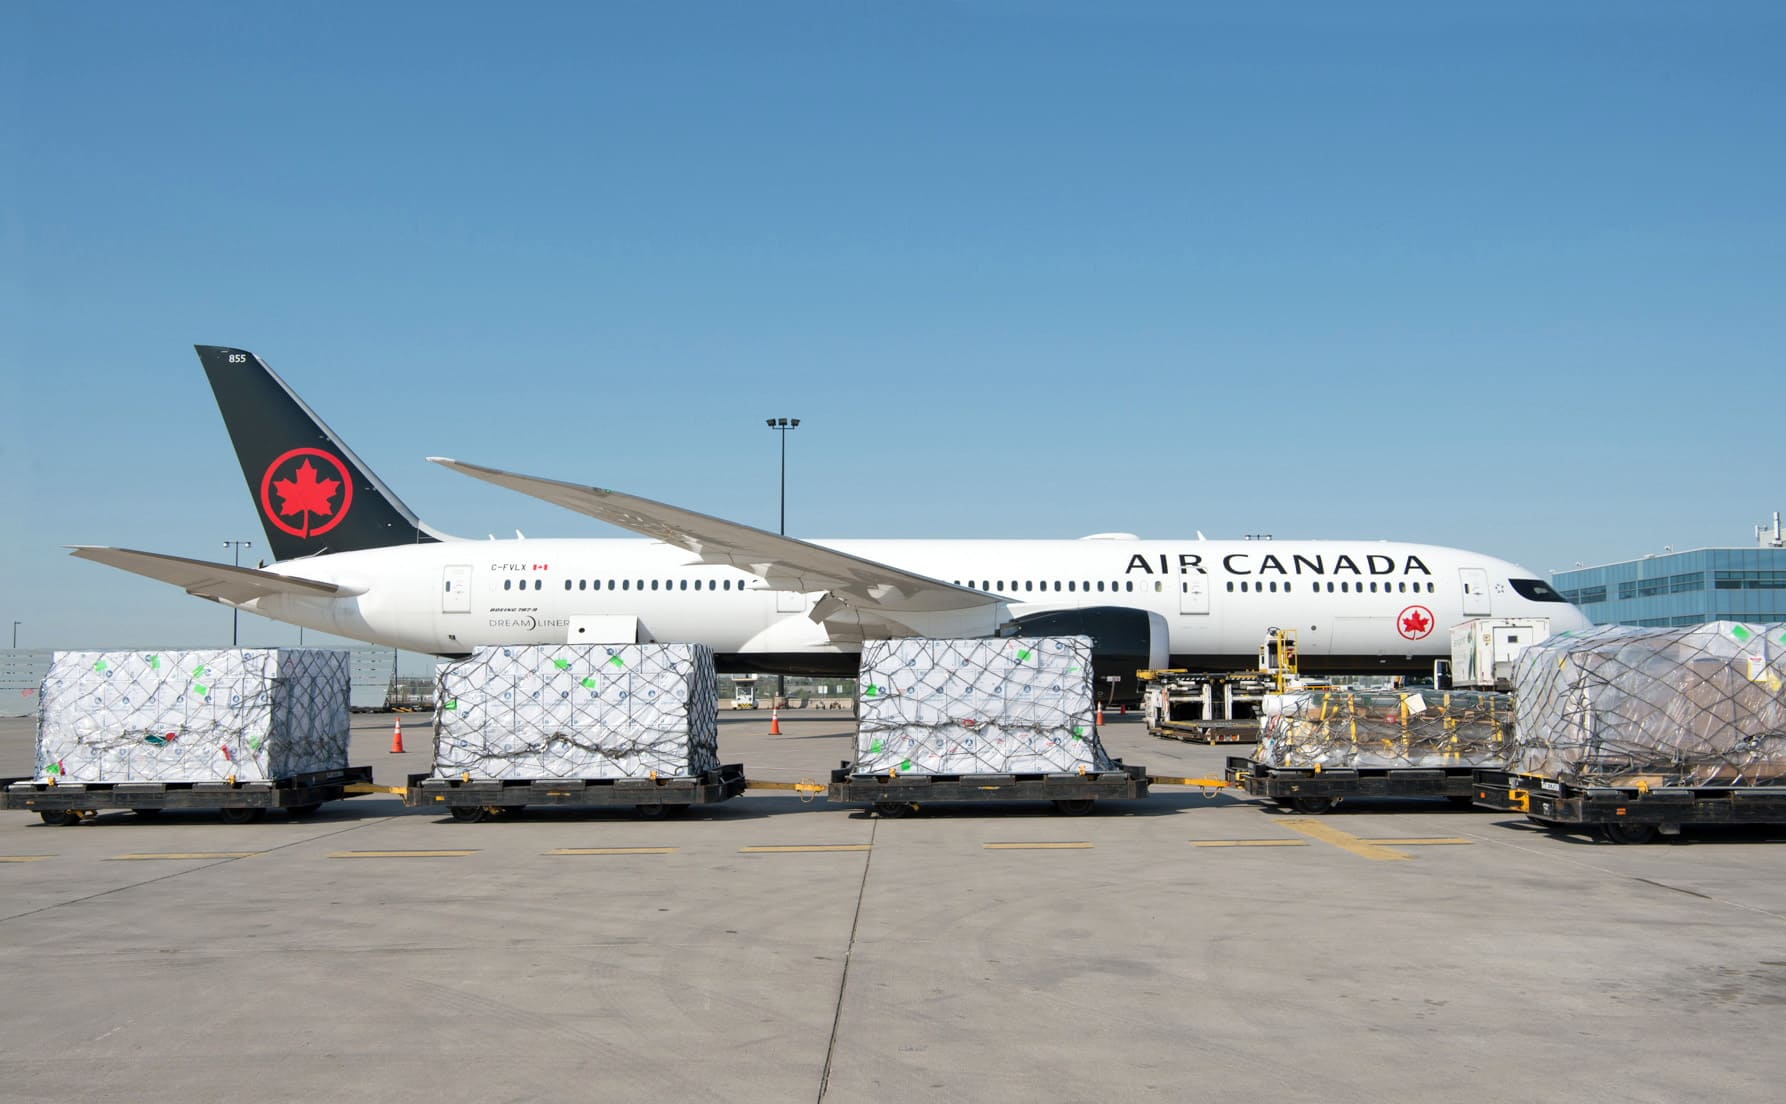 B787 Air Canada avec du fret